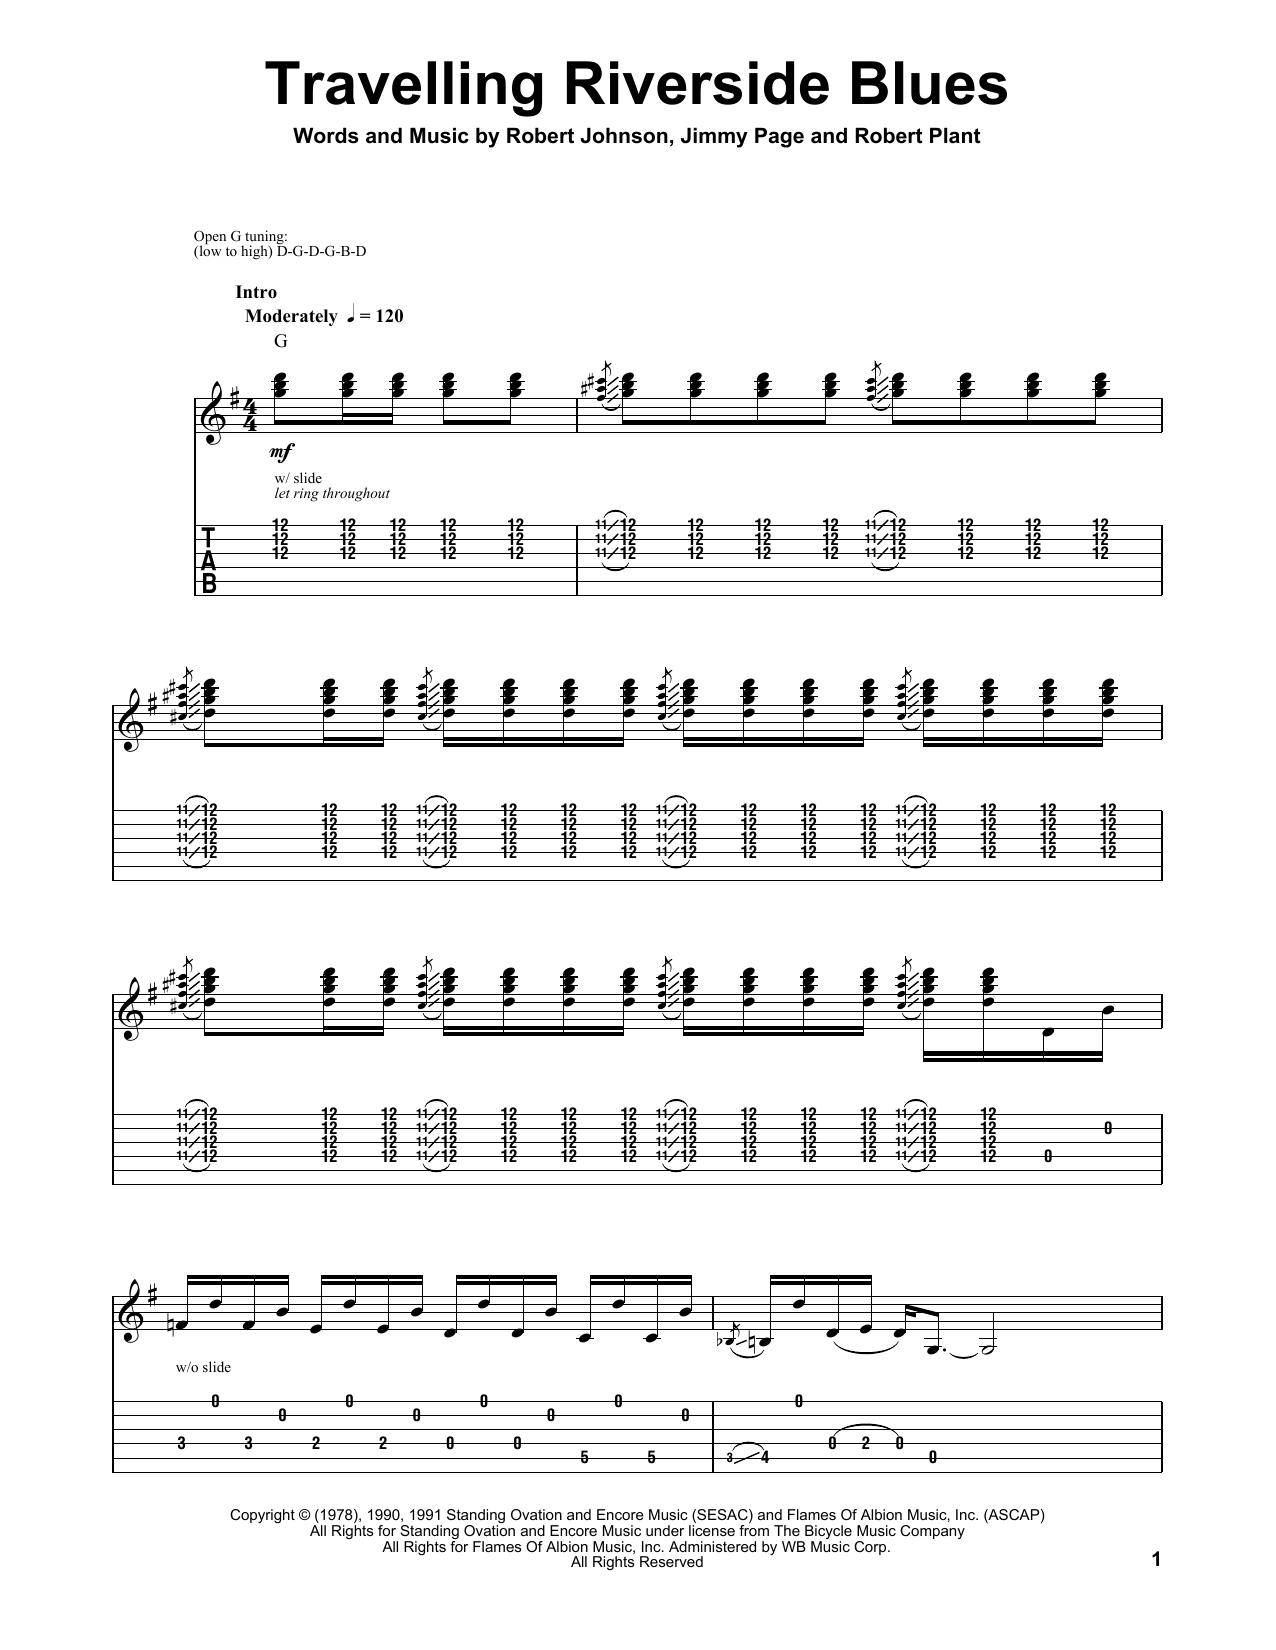 Robert Johnson Travelling Riverside Blues Sheet Music Notes